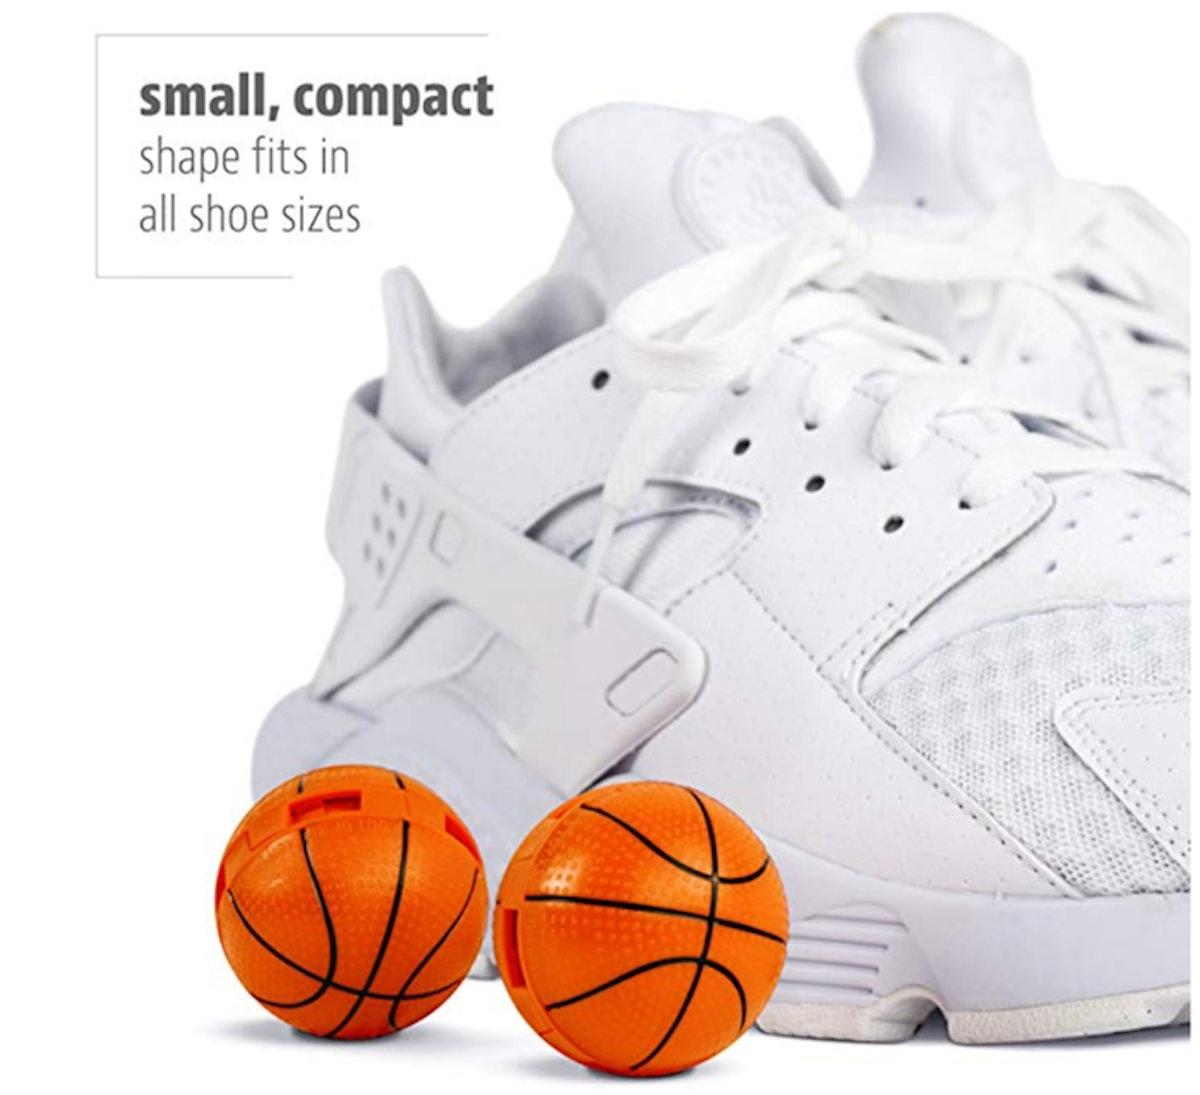 Sof Sole Sneaker Balls (3 Pack)